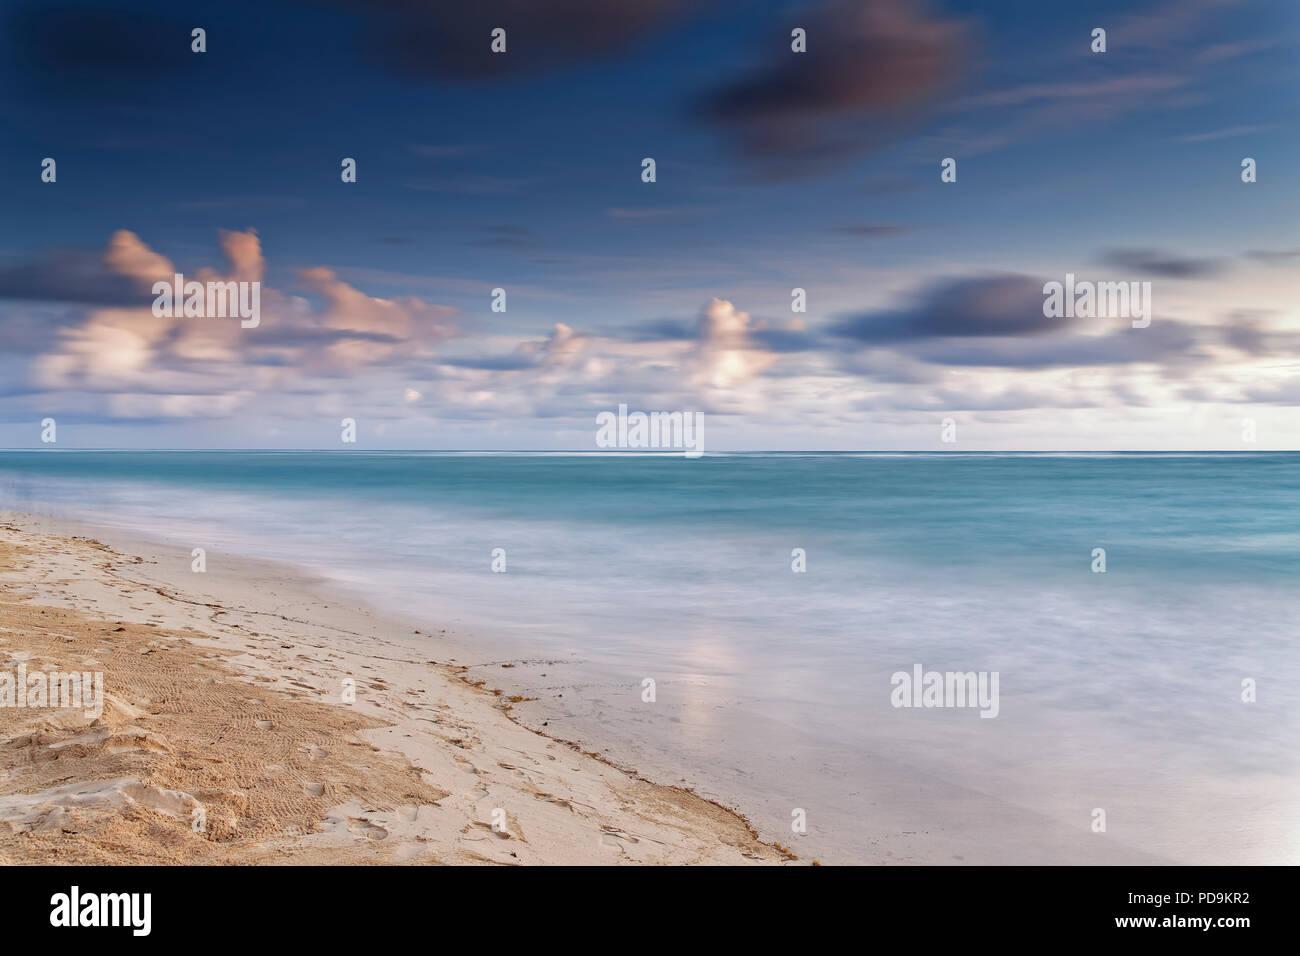 Sandstrand, Meer mit bewölktem Himmel, Playa Bavaro, Atlantik, Punta Cana, Dominikanische Republik Stockfoto